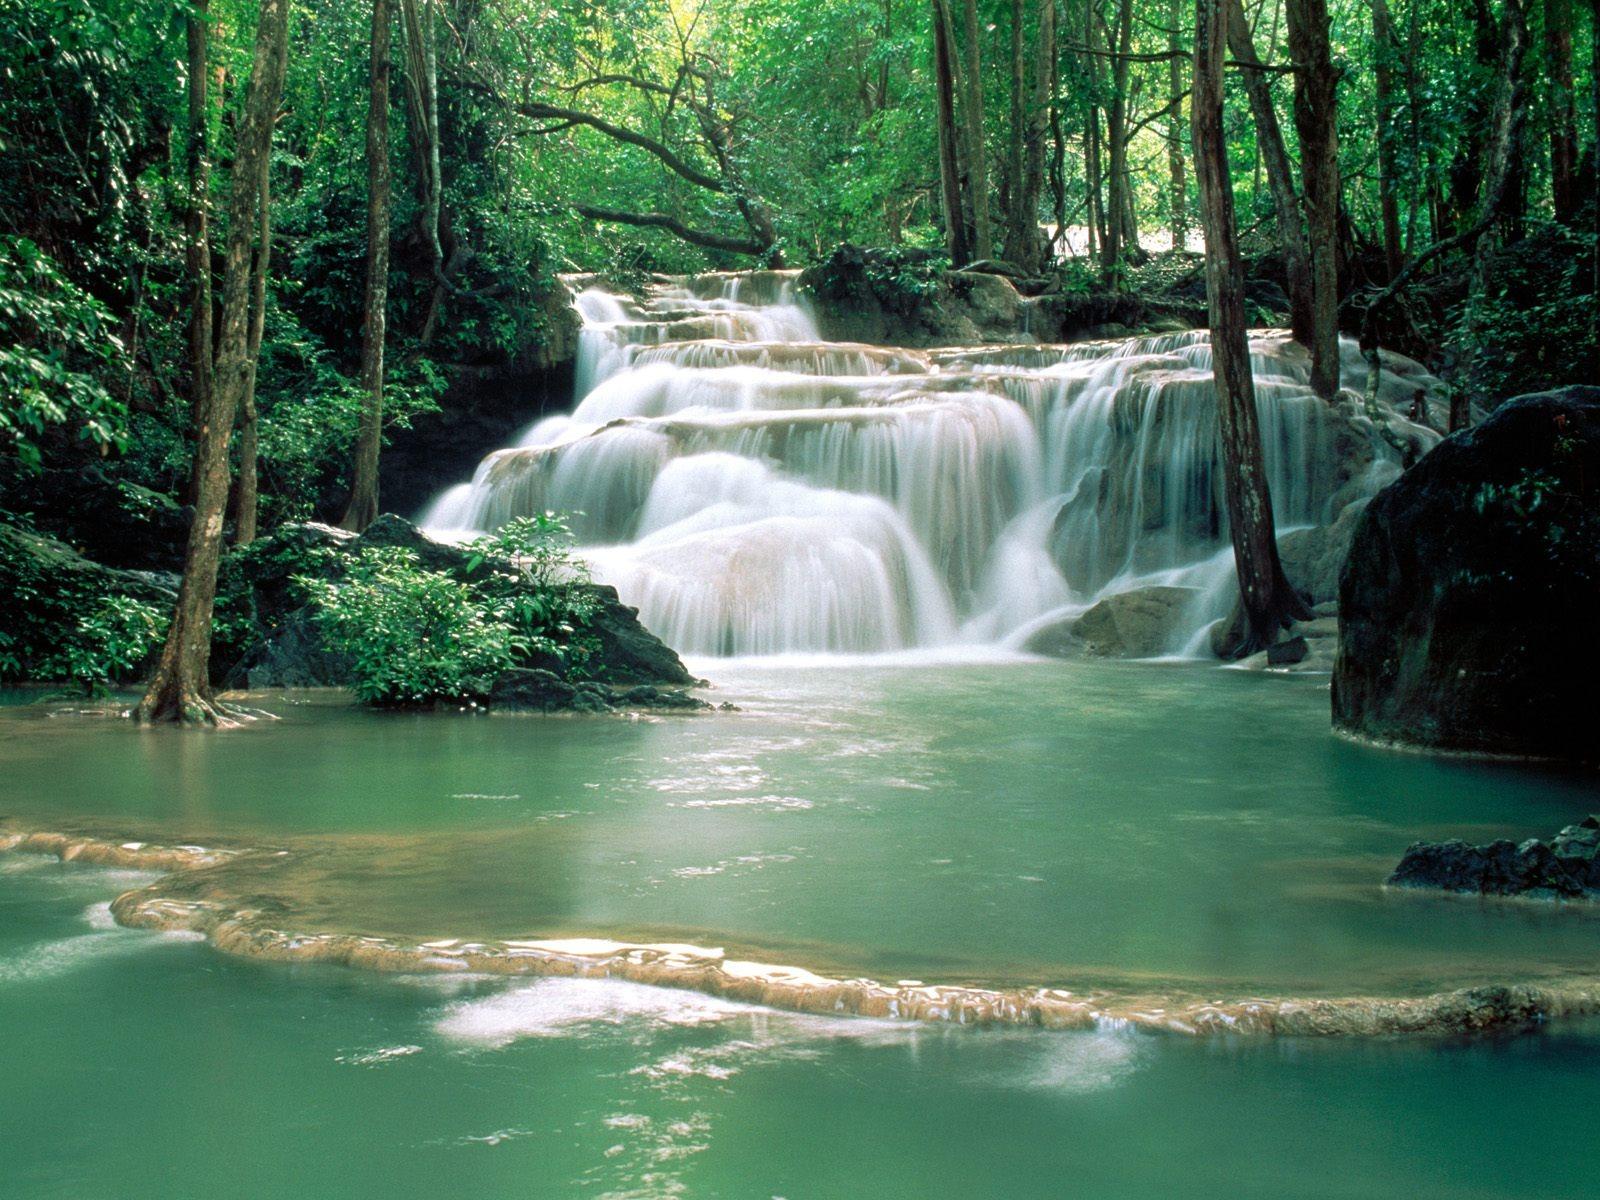 Beautiful Nature Wallpaper Free Download - Natural Beauty , HD Wallpaper & Backgrounds